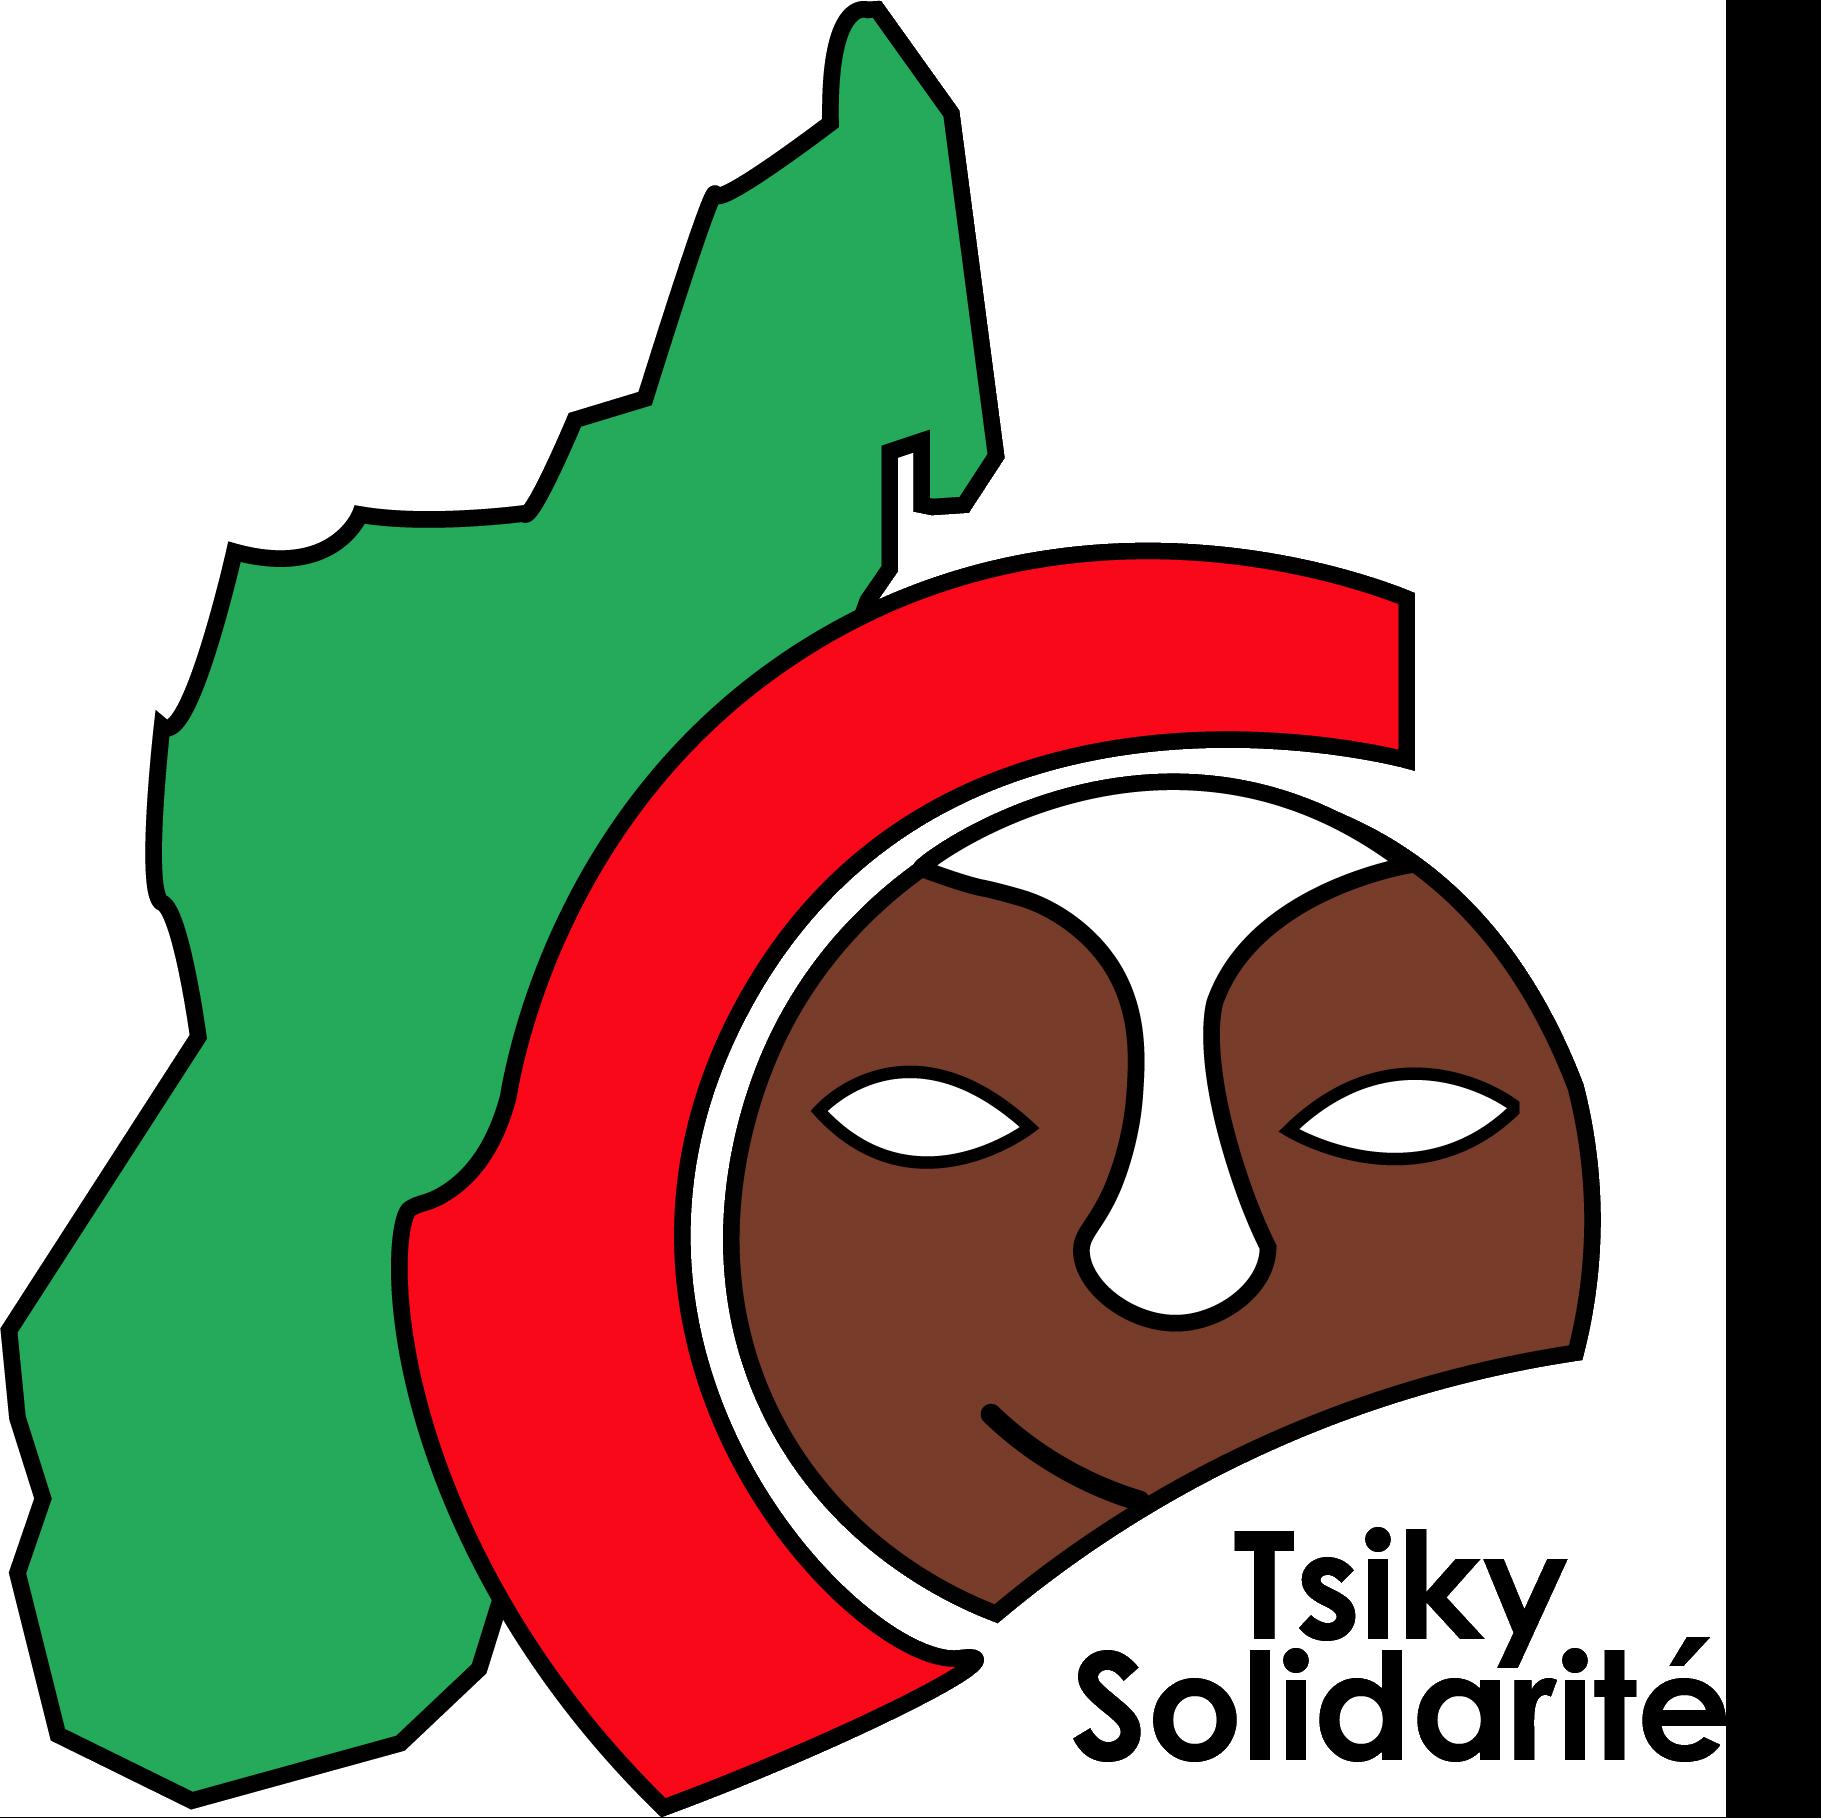 Tsiky Solidarité